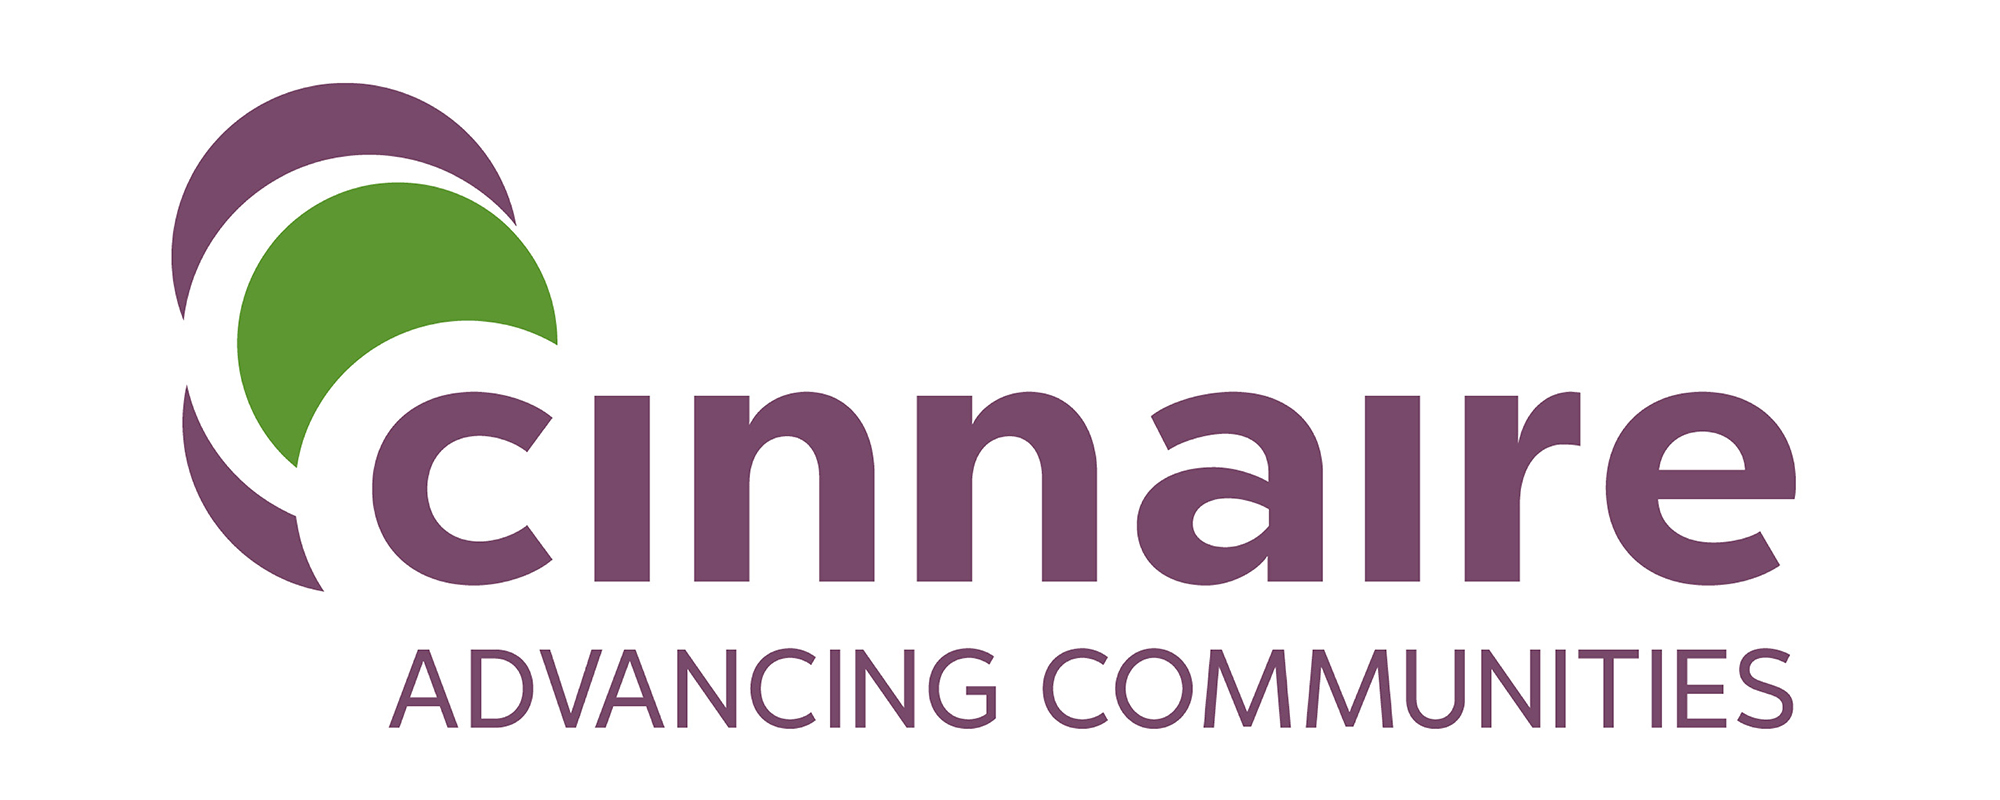 cinnaire-logo copy.jpg